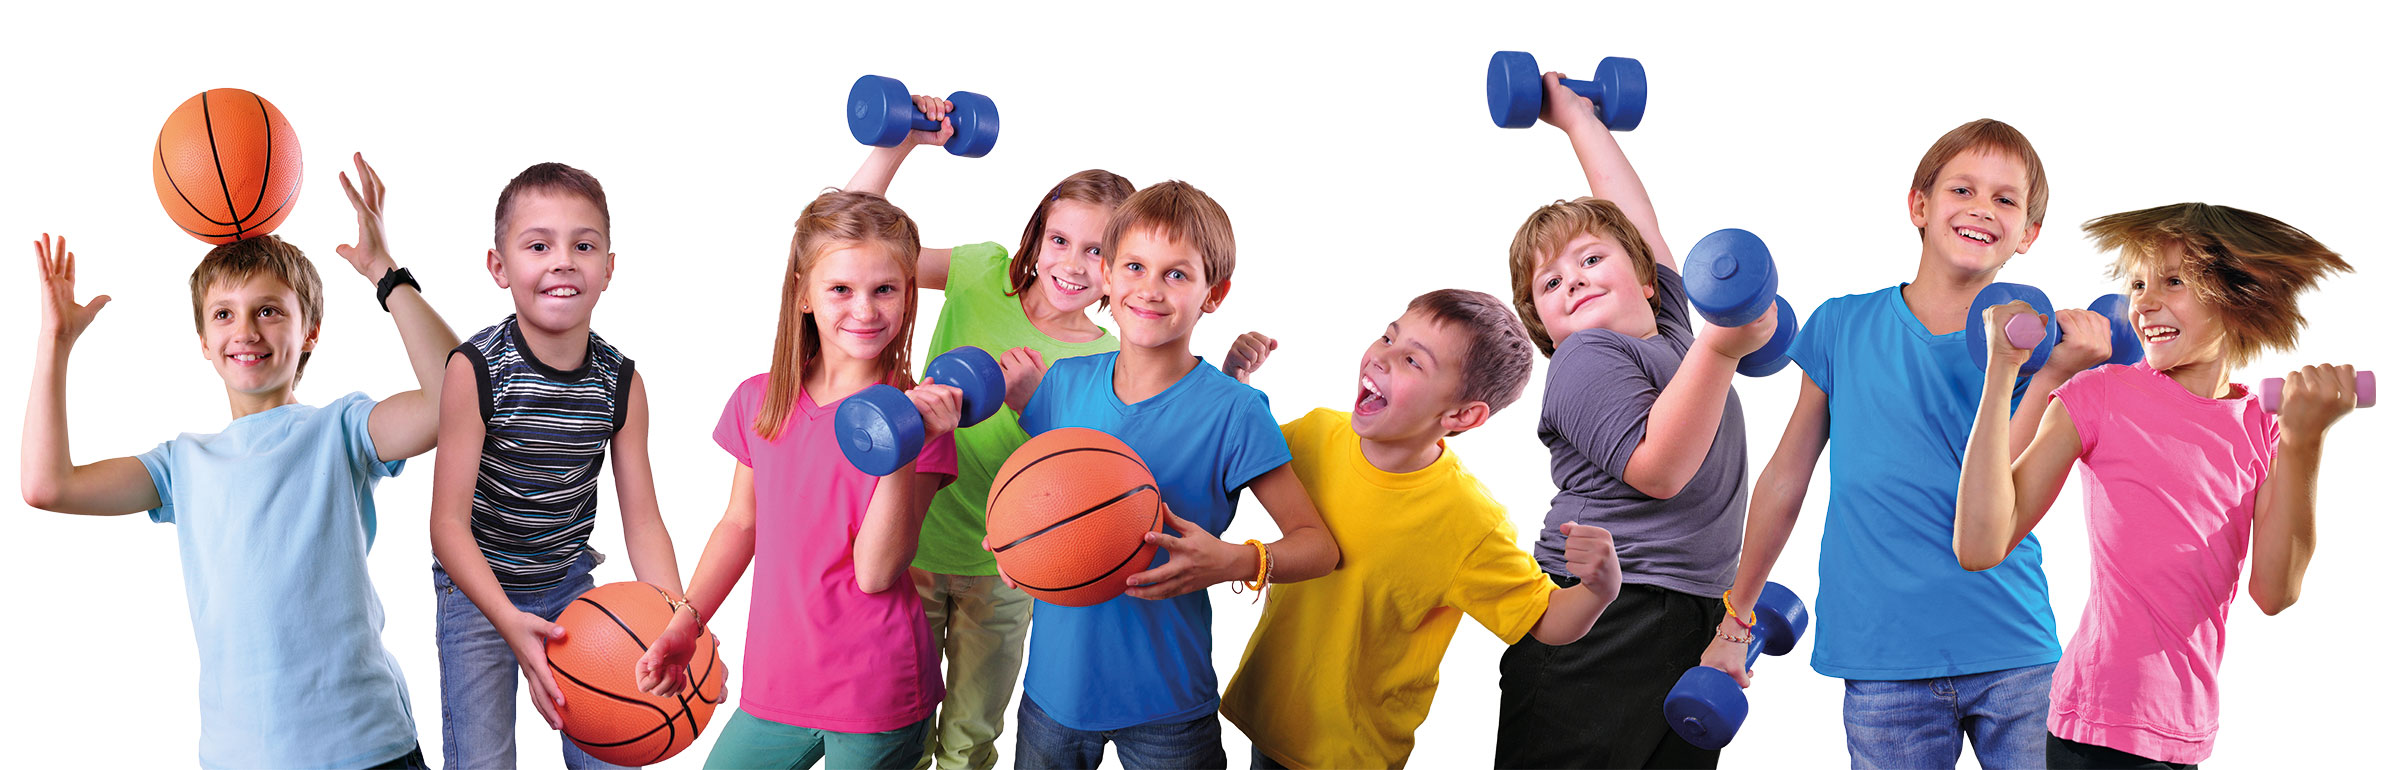 Kinder bei verschiedenen Sportarten